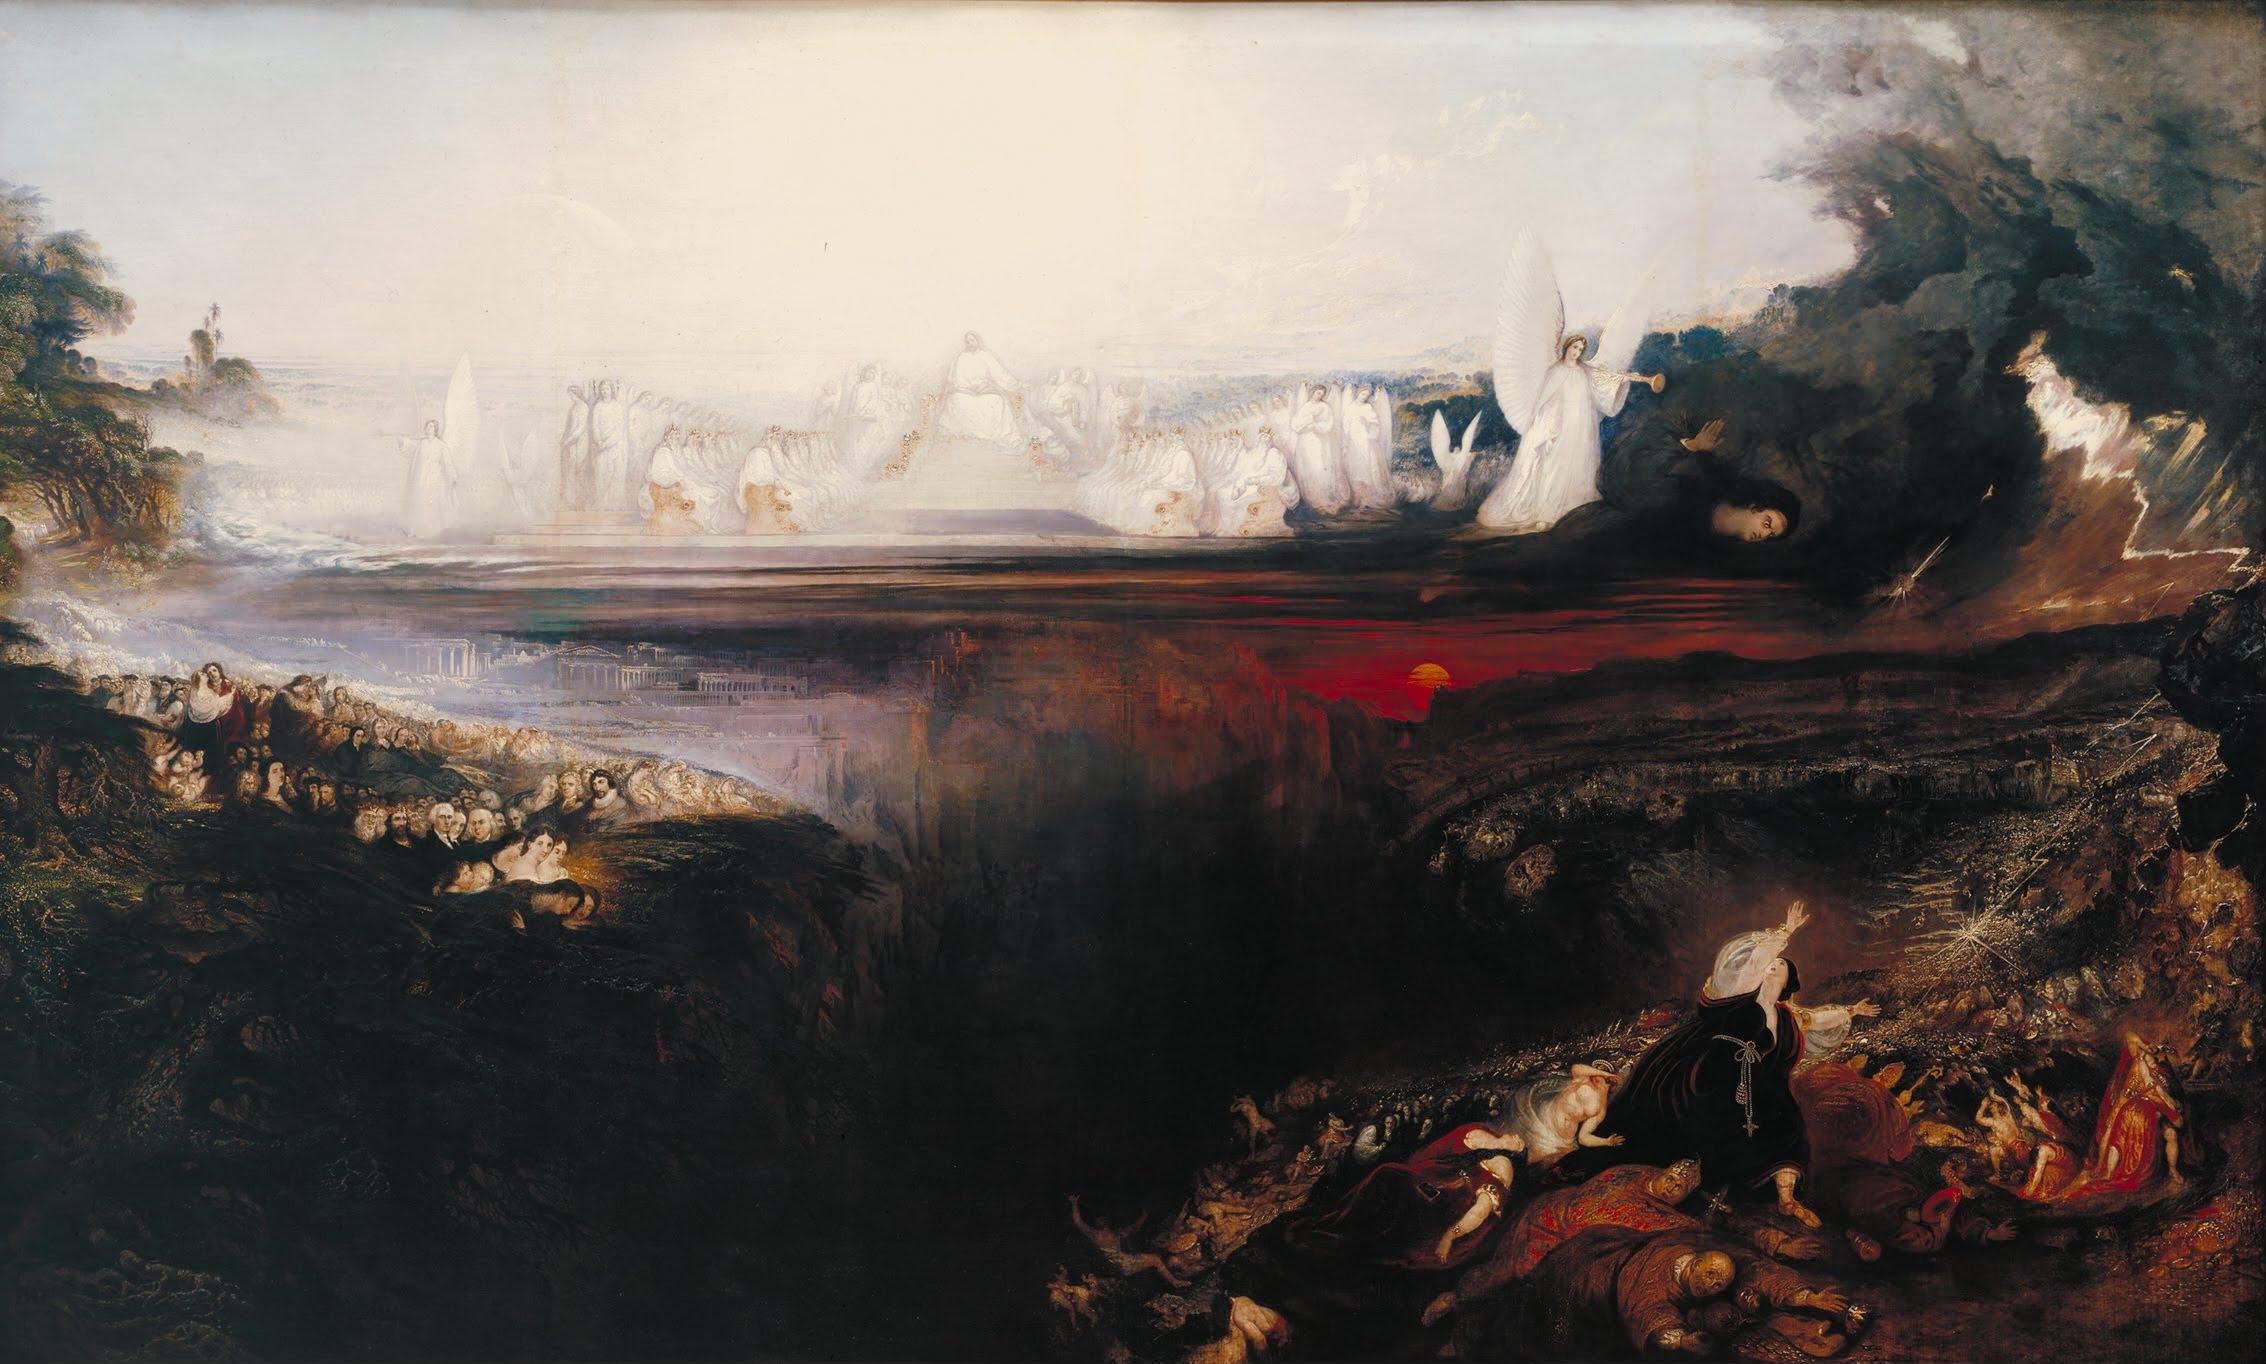 A2 - John_Martin_-_The_Last_Judgement_1854